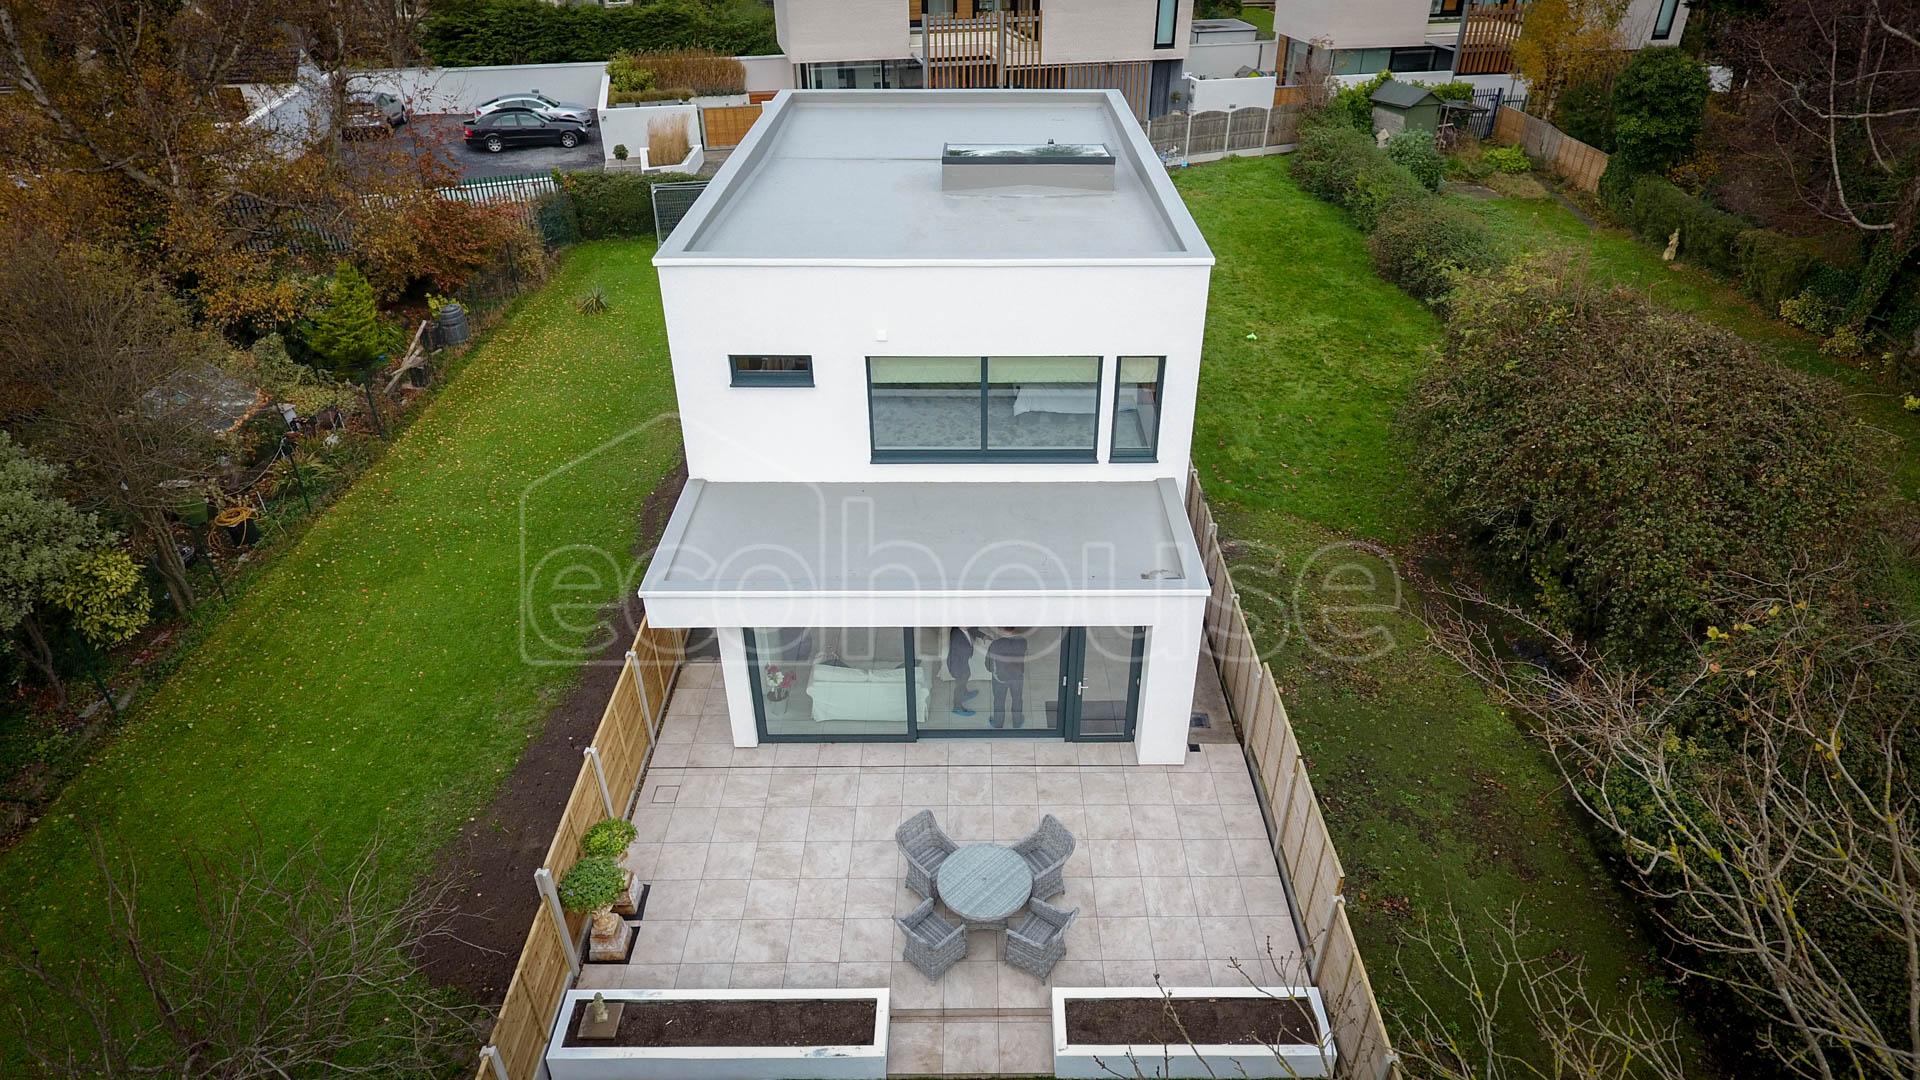 Ecohouse Clontarf Project